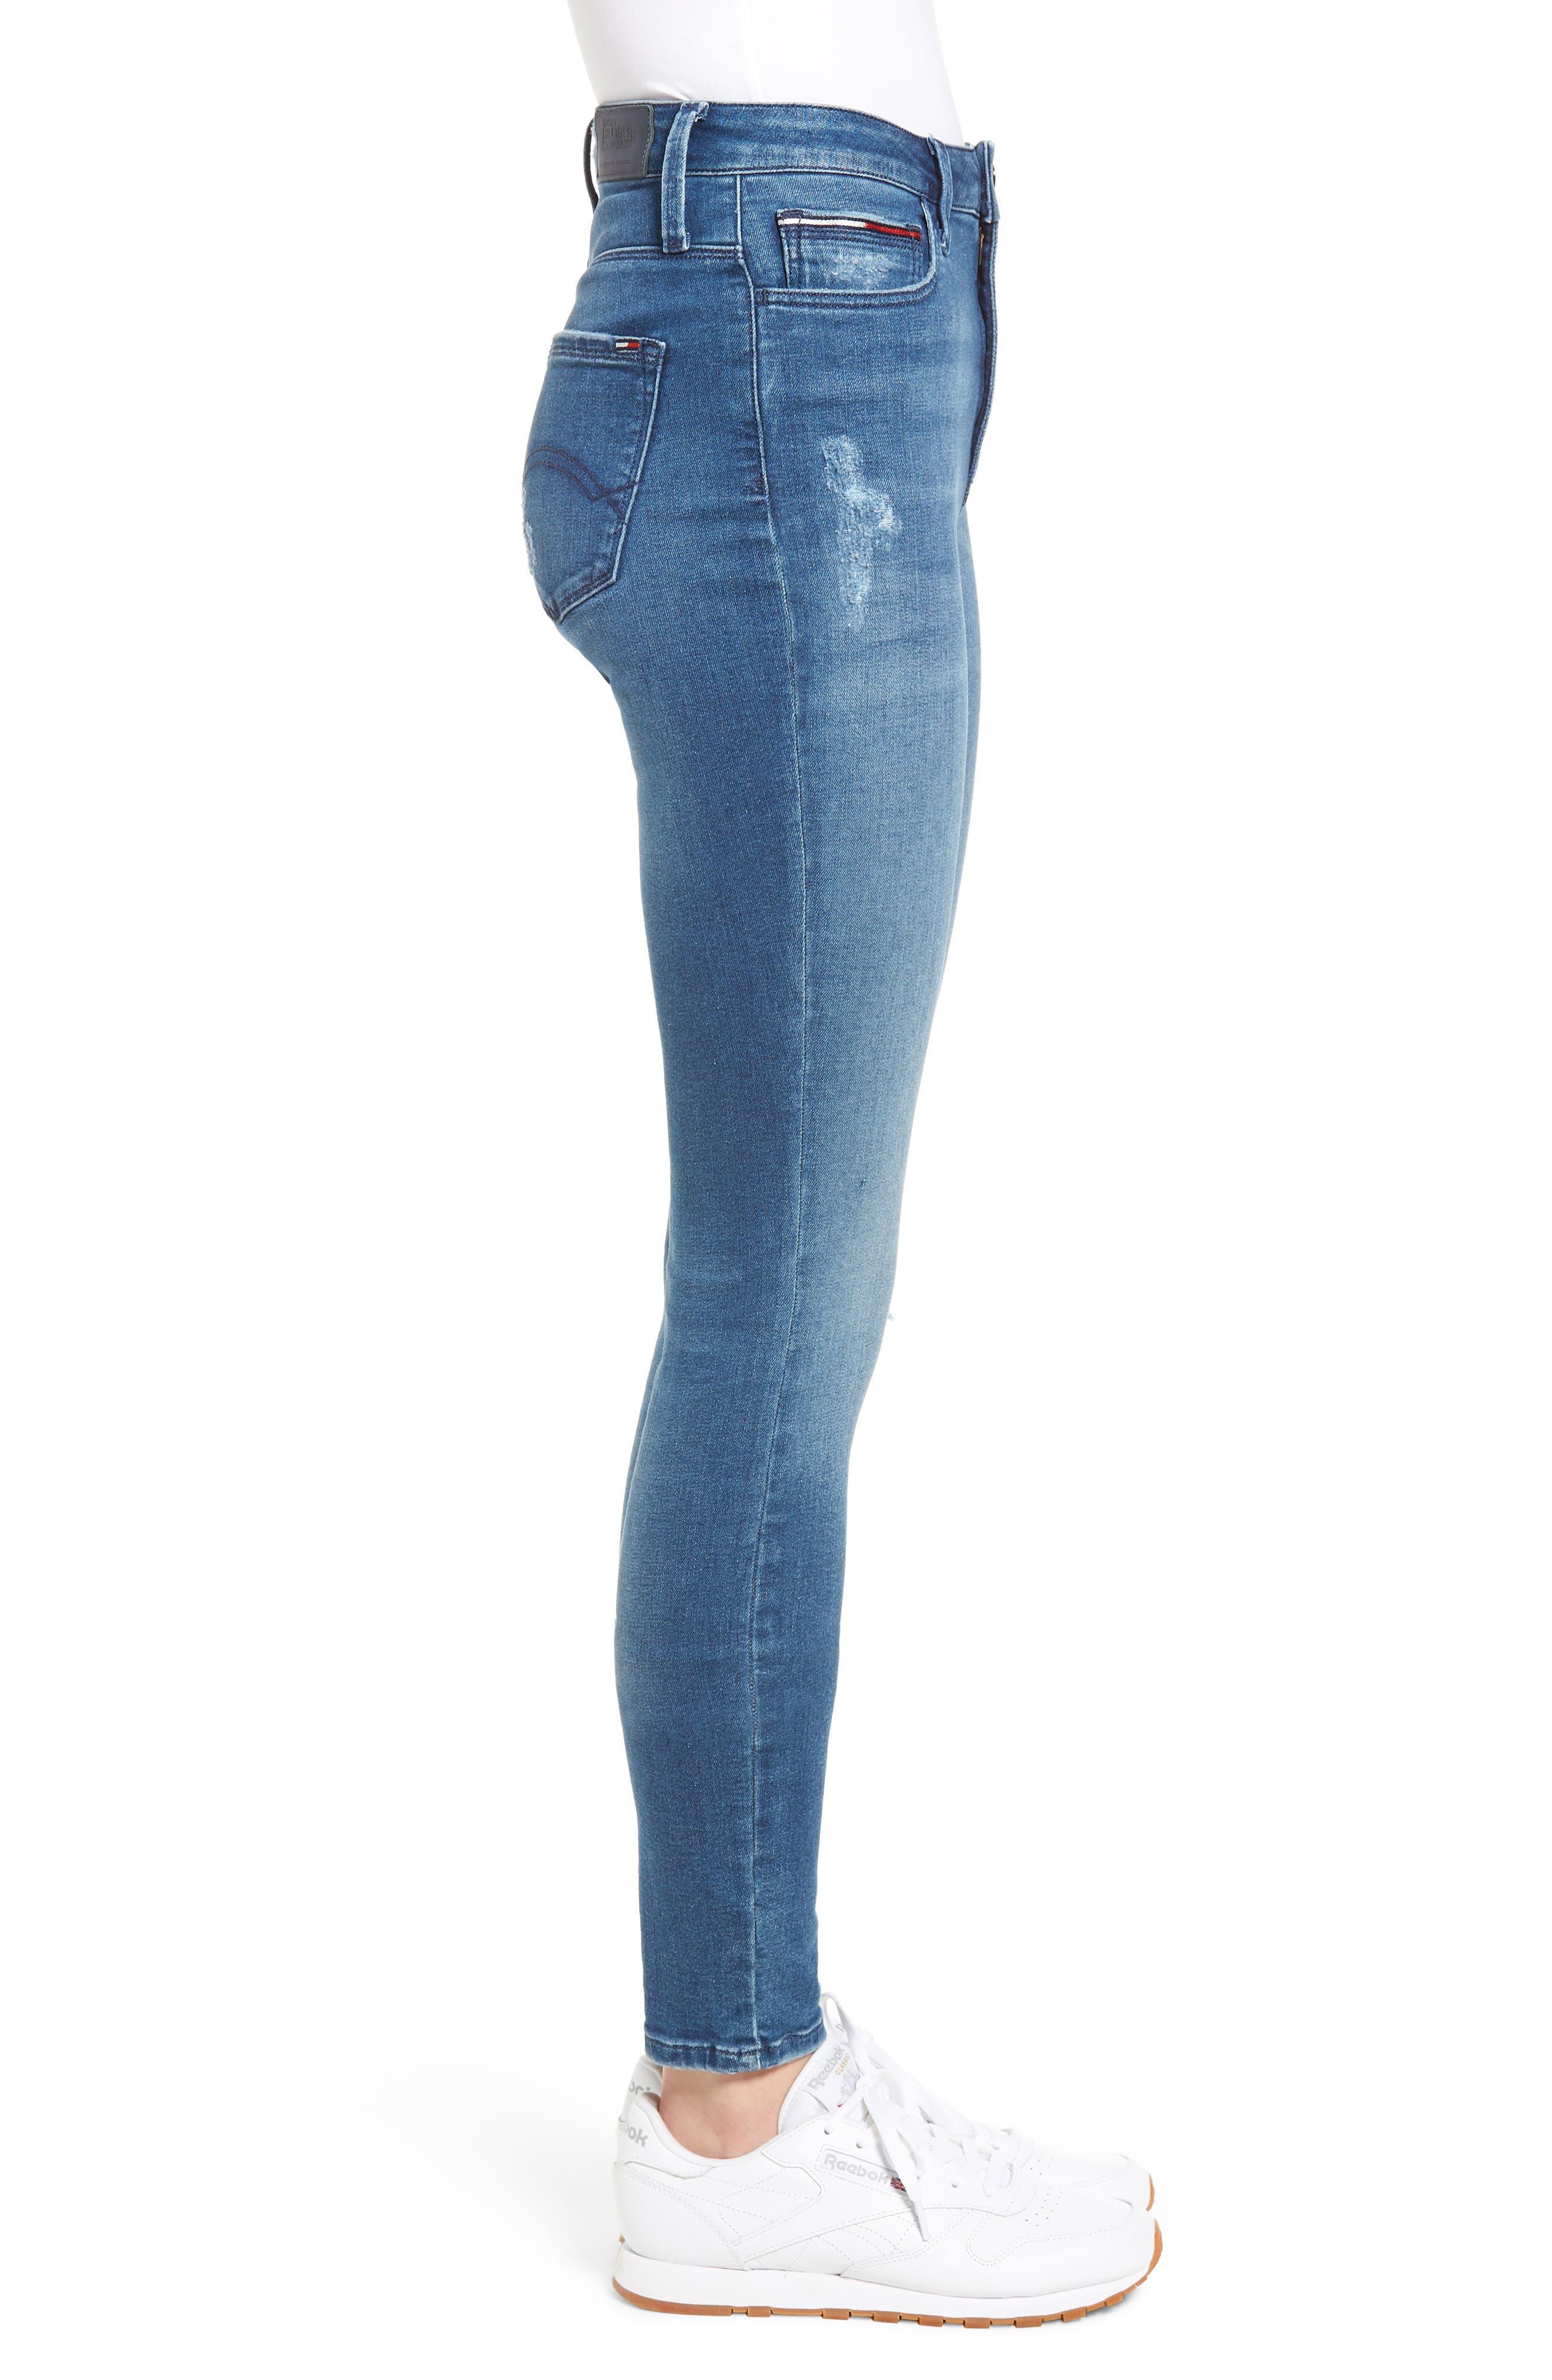 Santana Ripped Skinny Jeans,                             Alternate thumbnail 3, color,